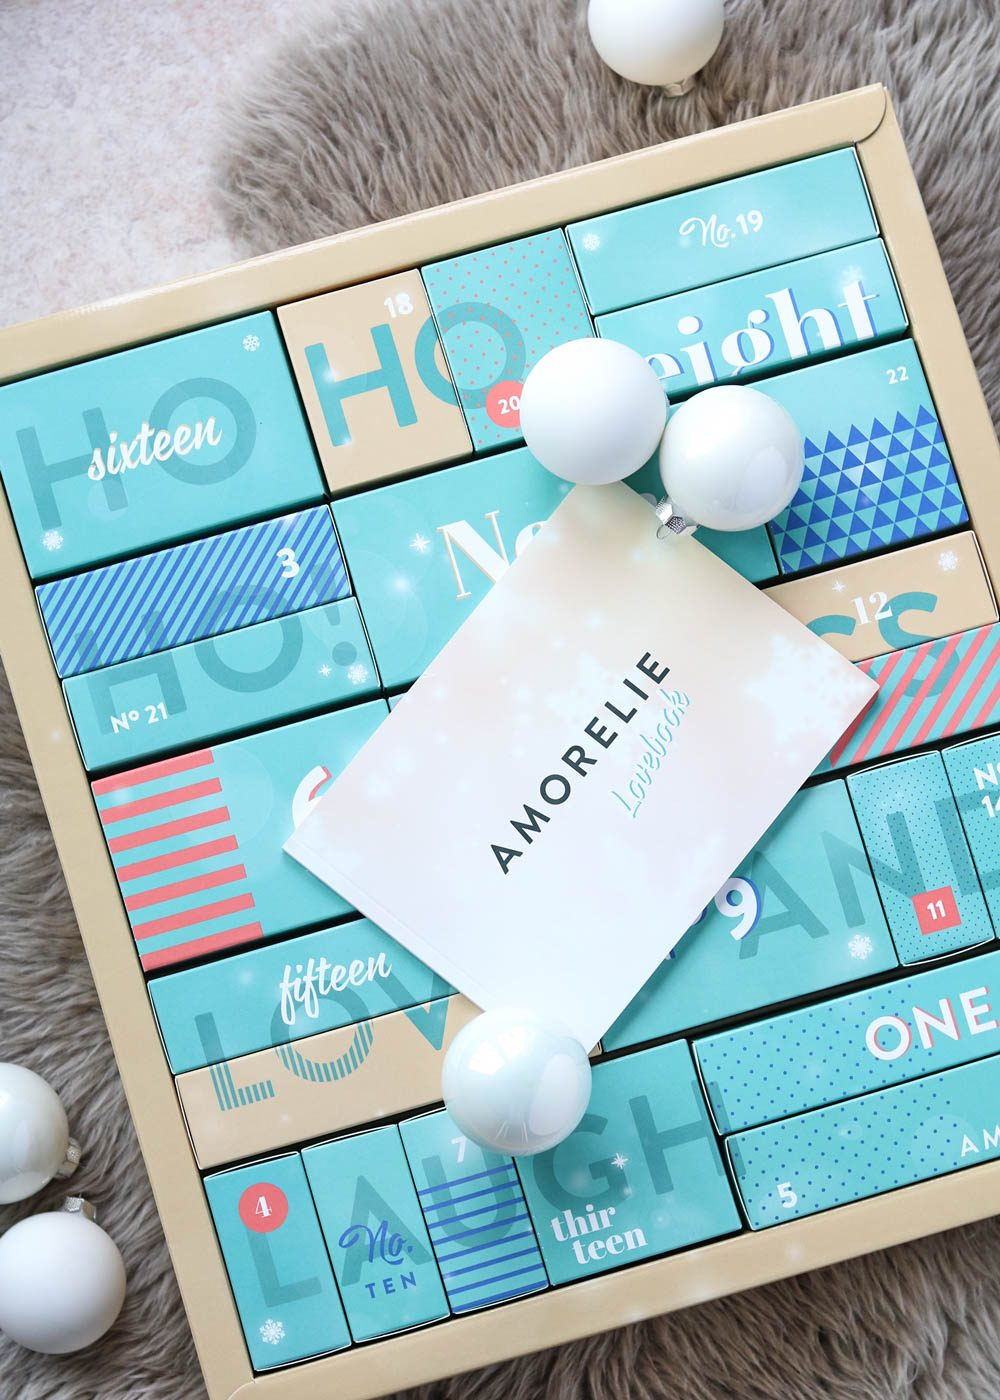 amorelie-adventskalender-gewinnspiel-2